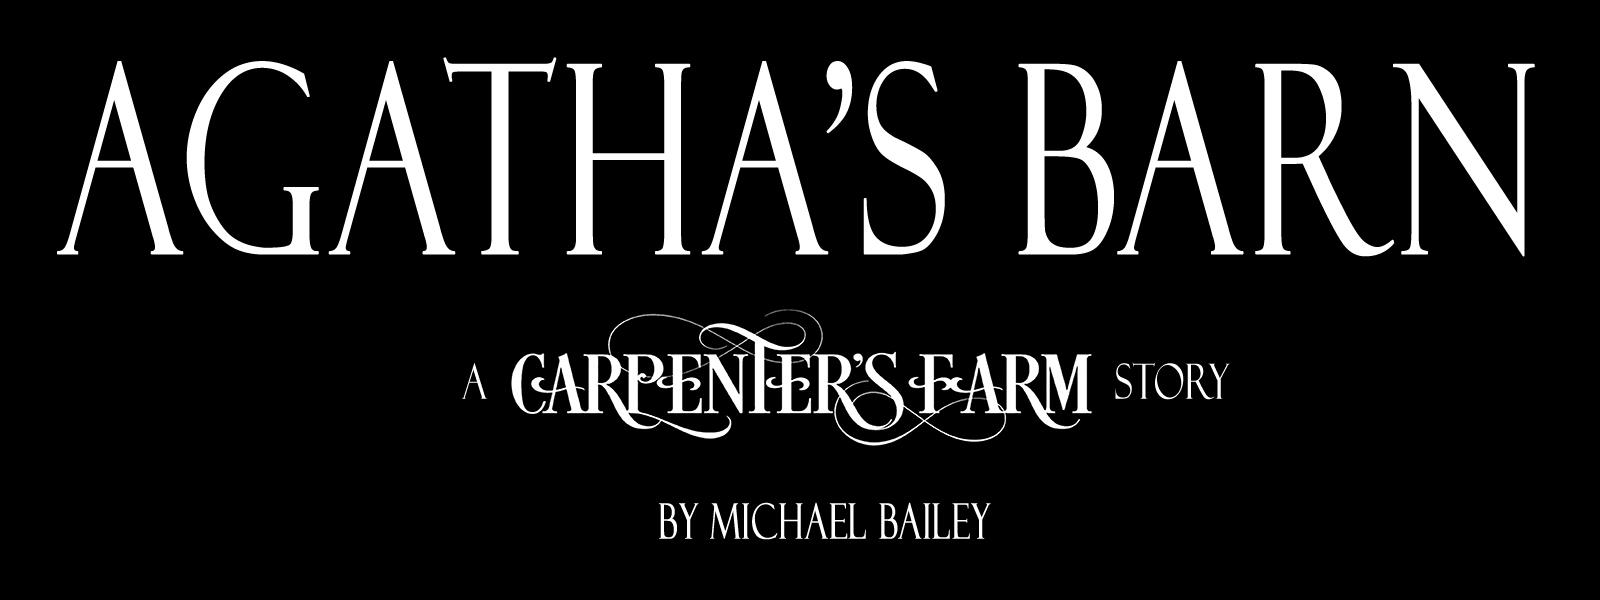 agathas_barn_logo